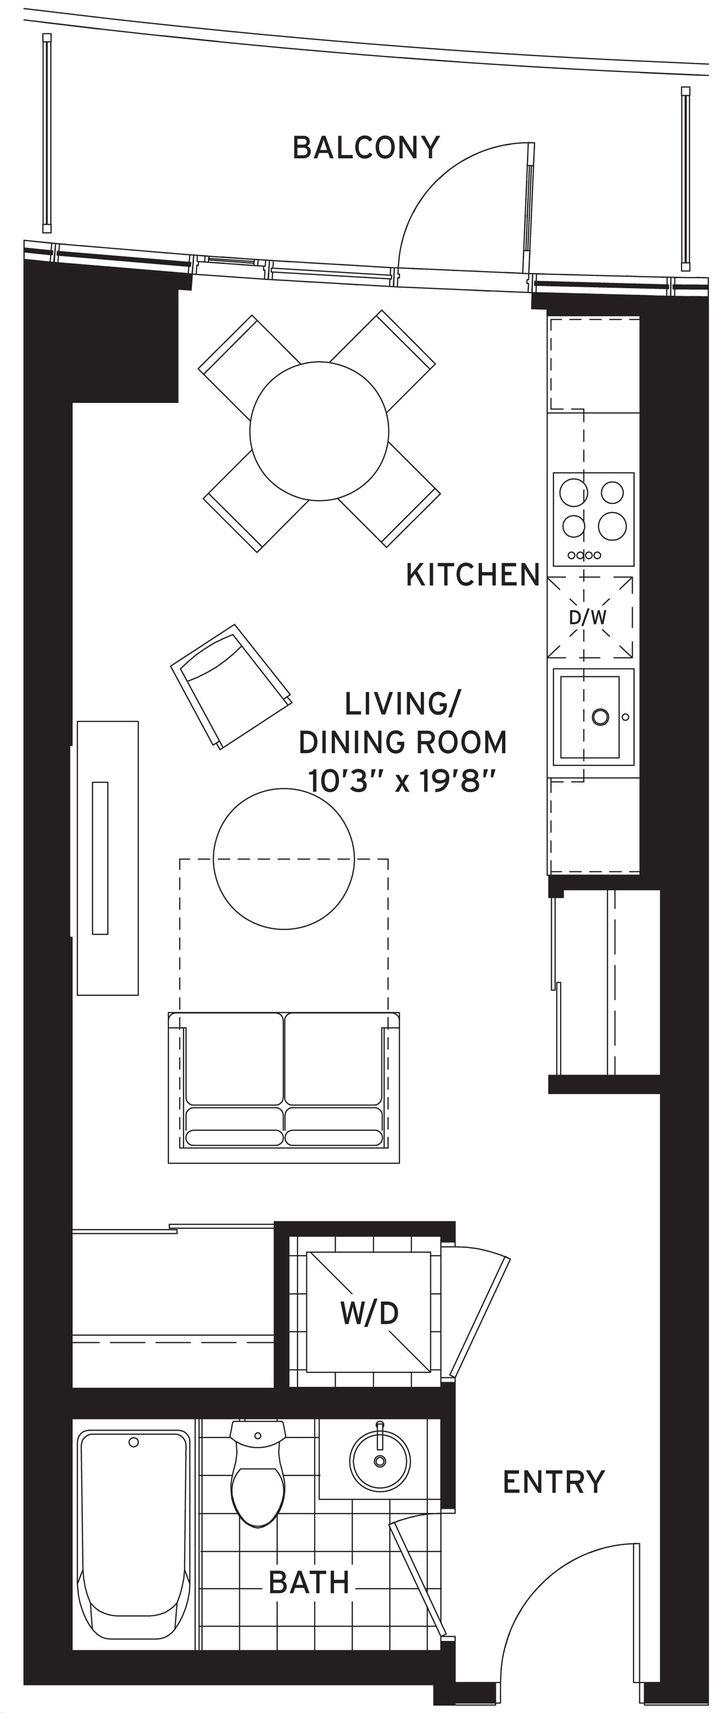 Cinema Tower By Daniels The Cameron Floorplan Bed 1 Bath